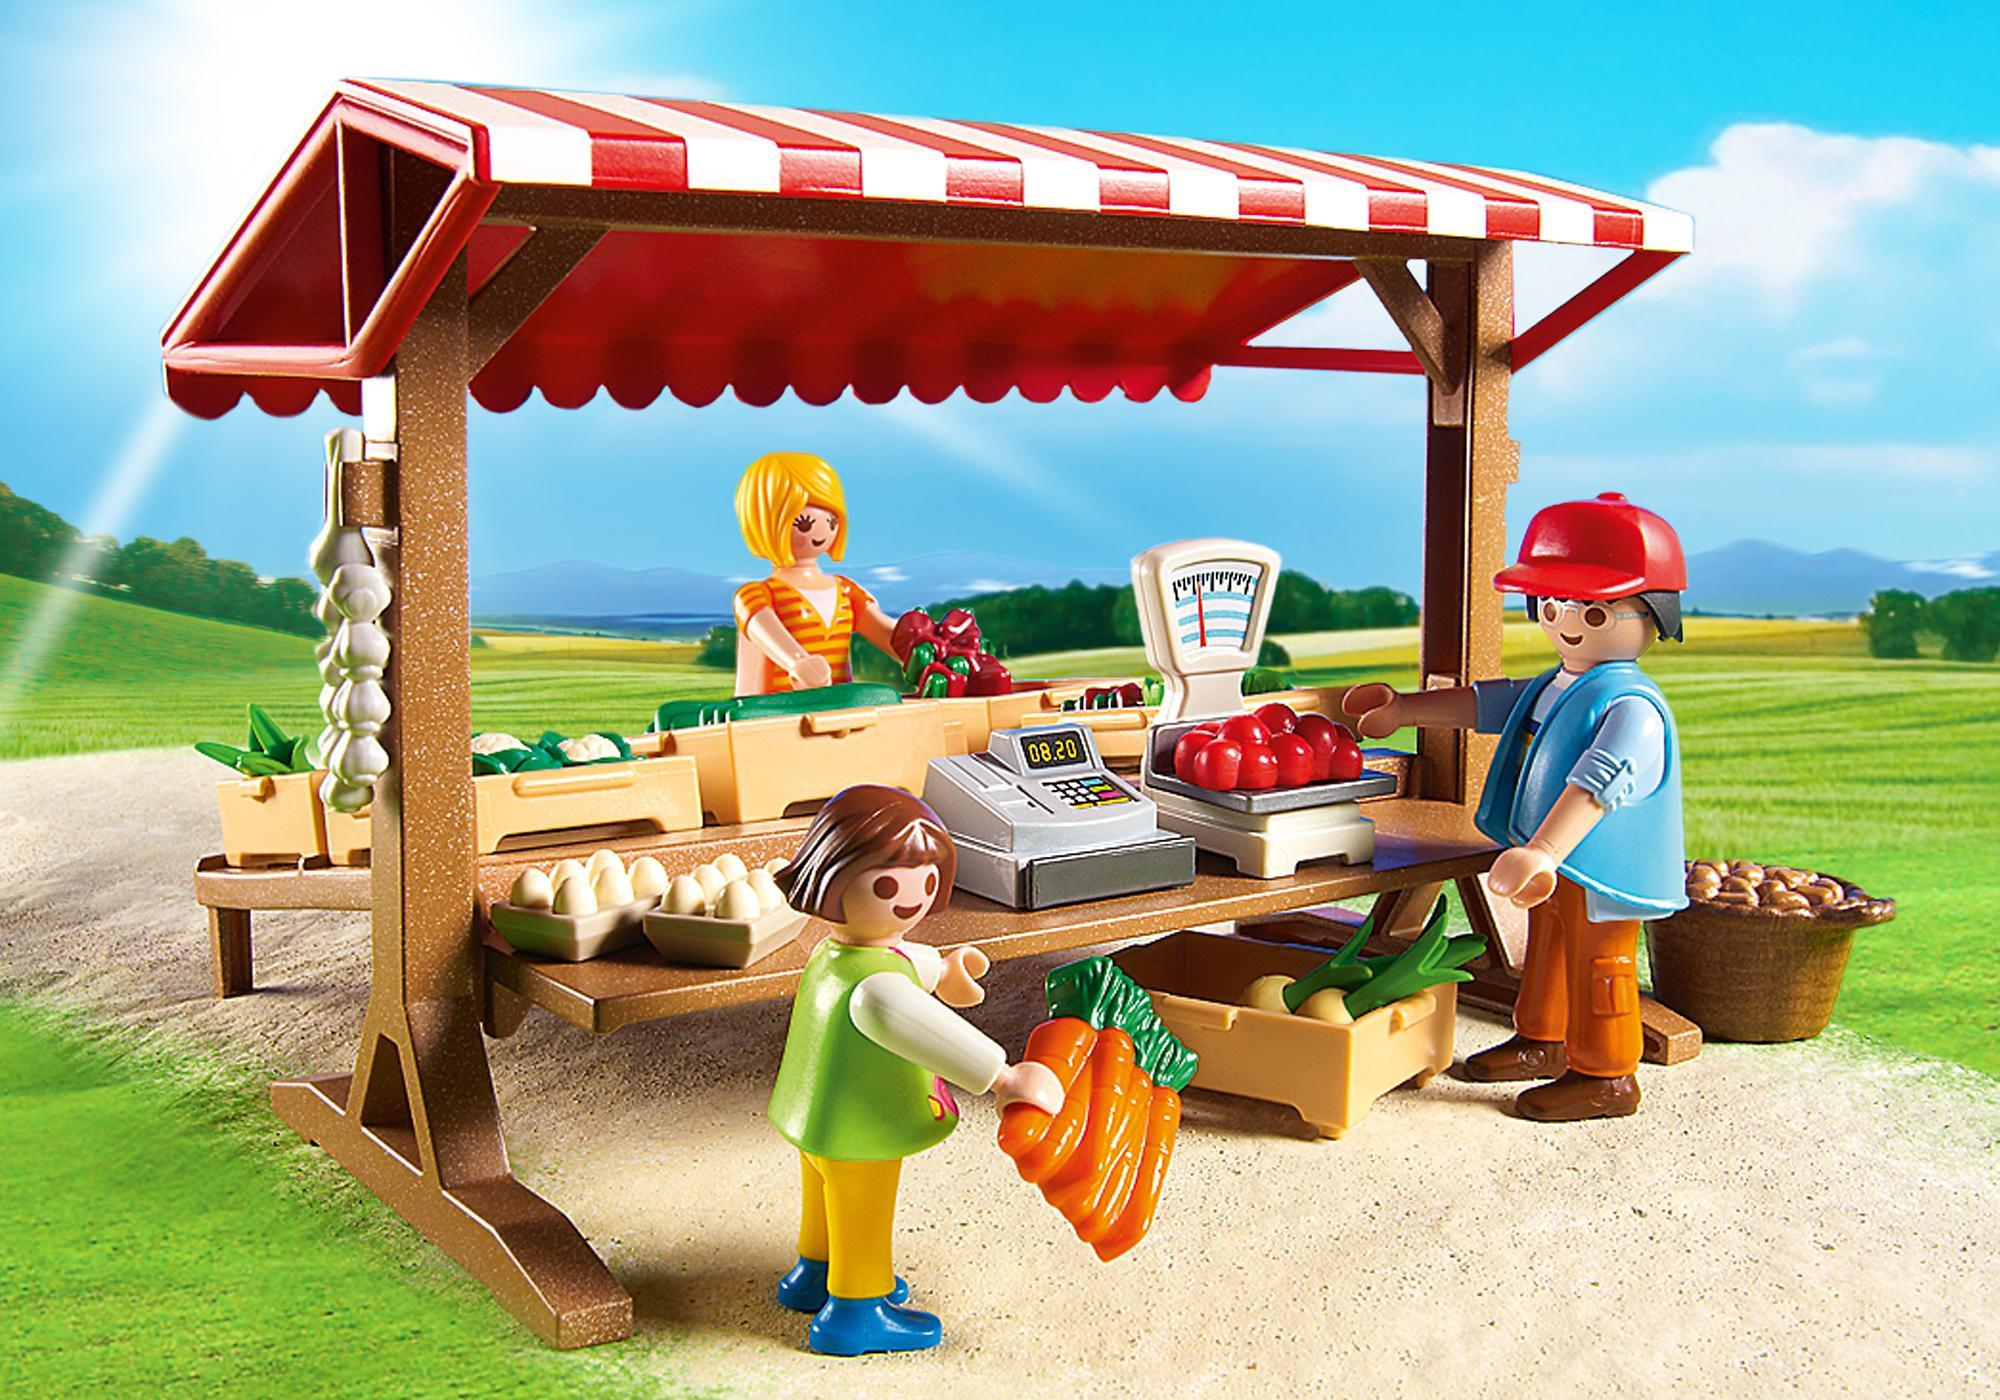 http://media.playmobil.com/i/playmobil/6121_product_extra1/Stragan z warzywami